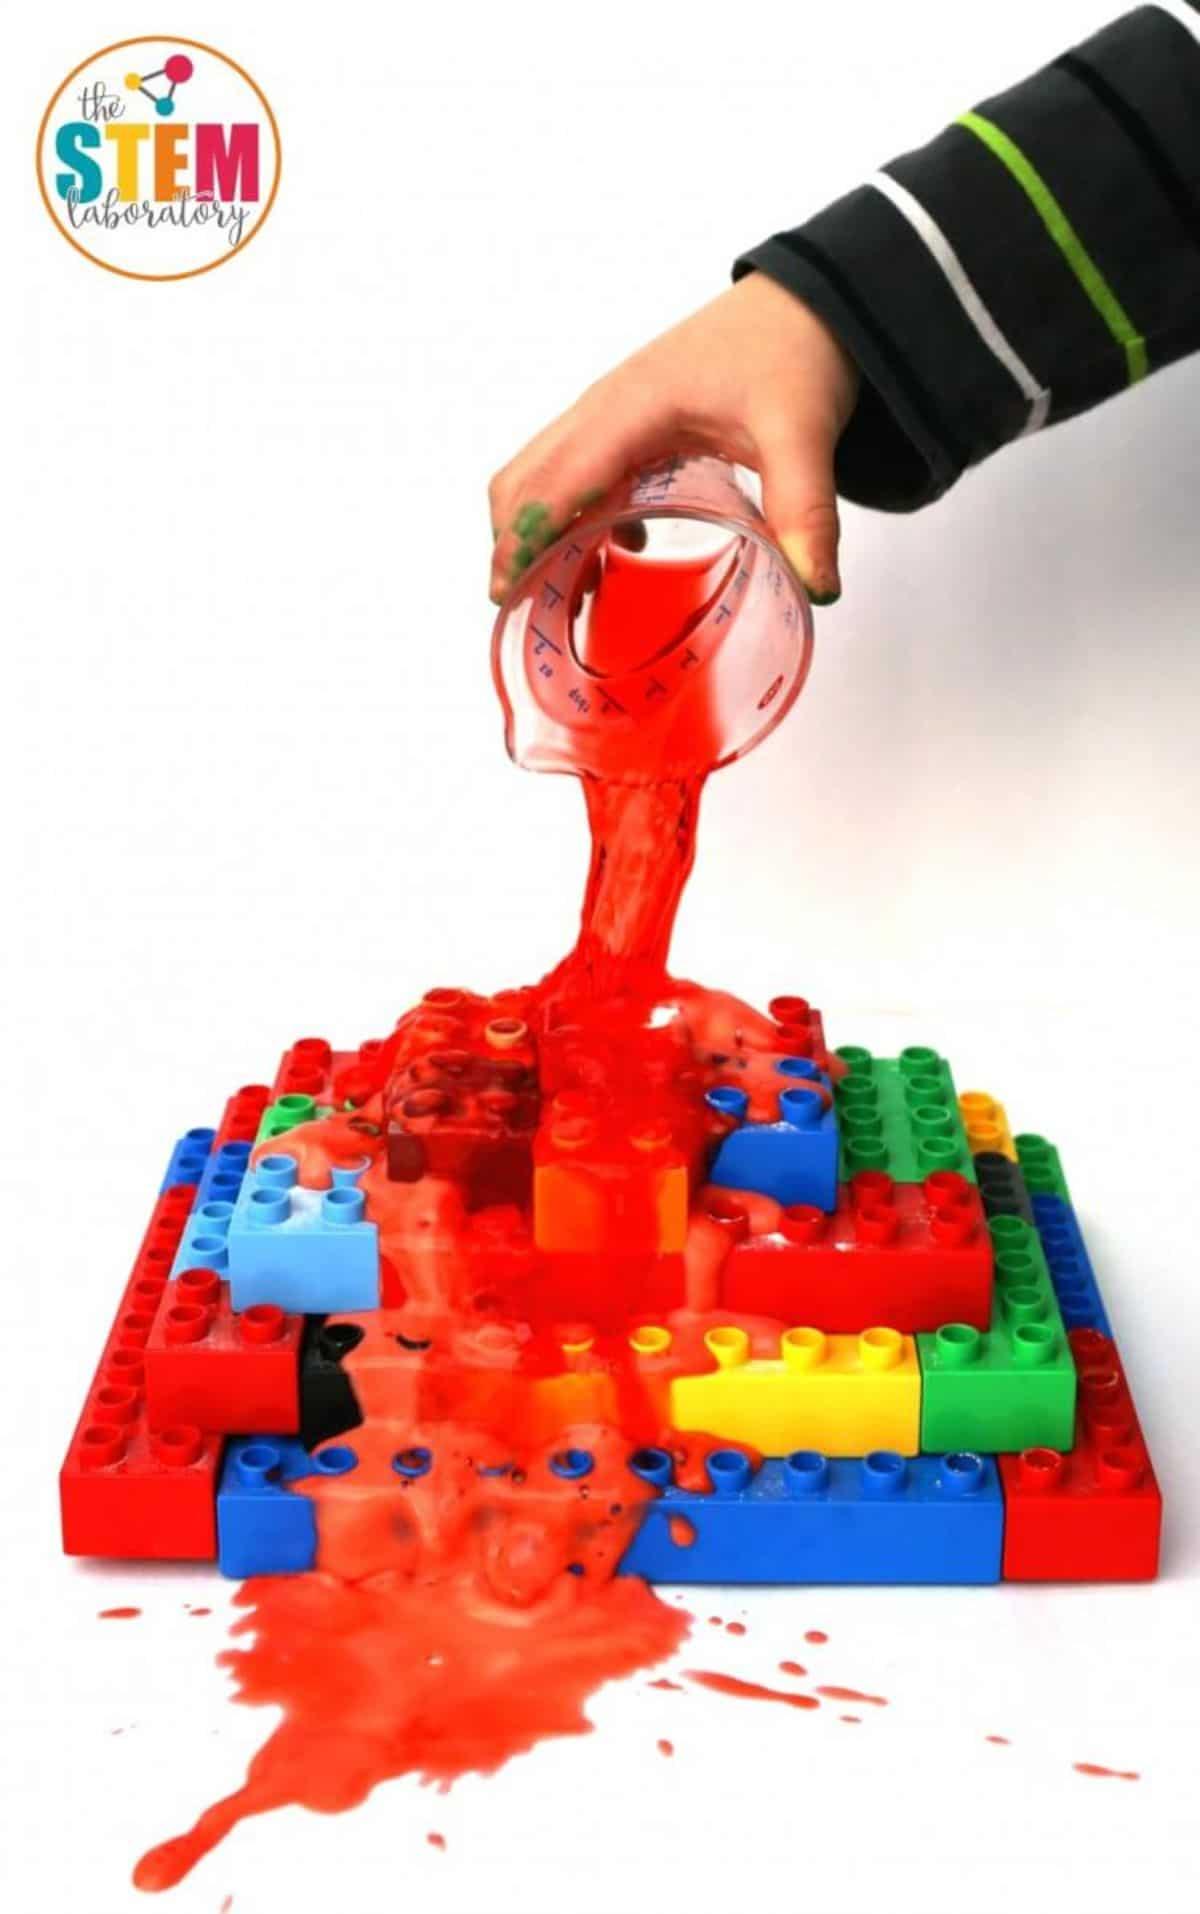 a hand pours red liquid onto a pyramid made of lego